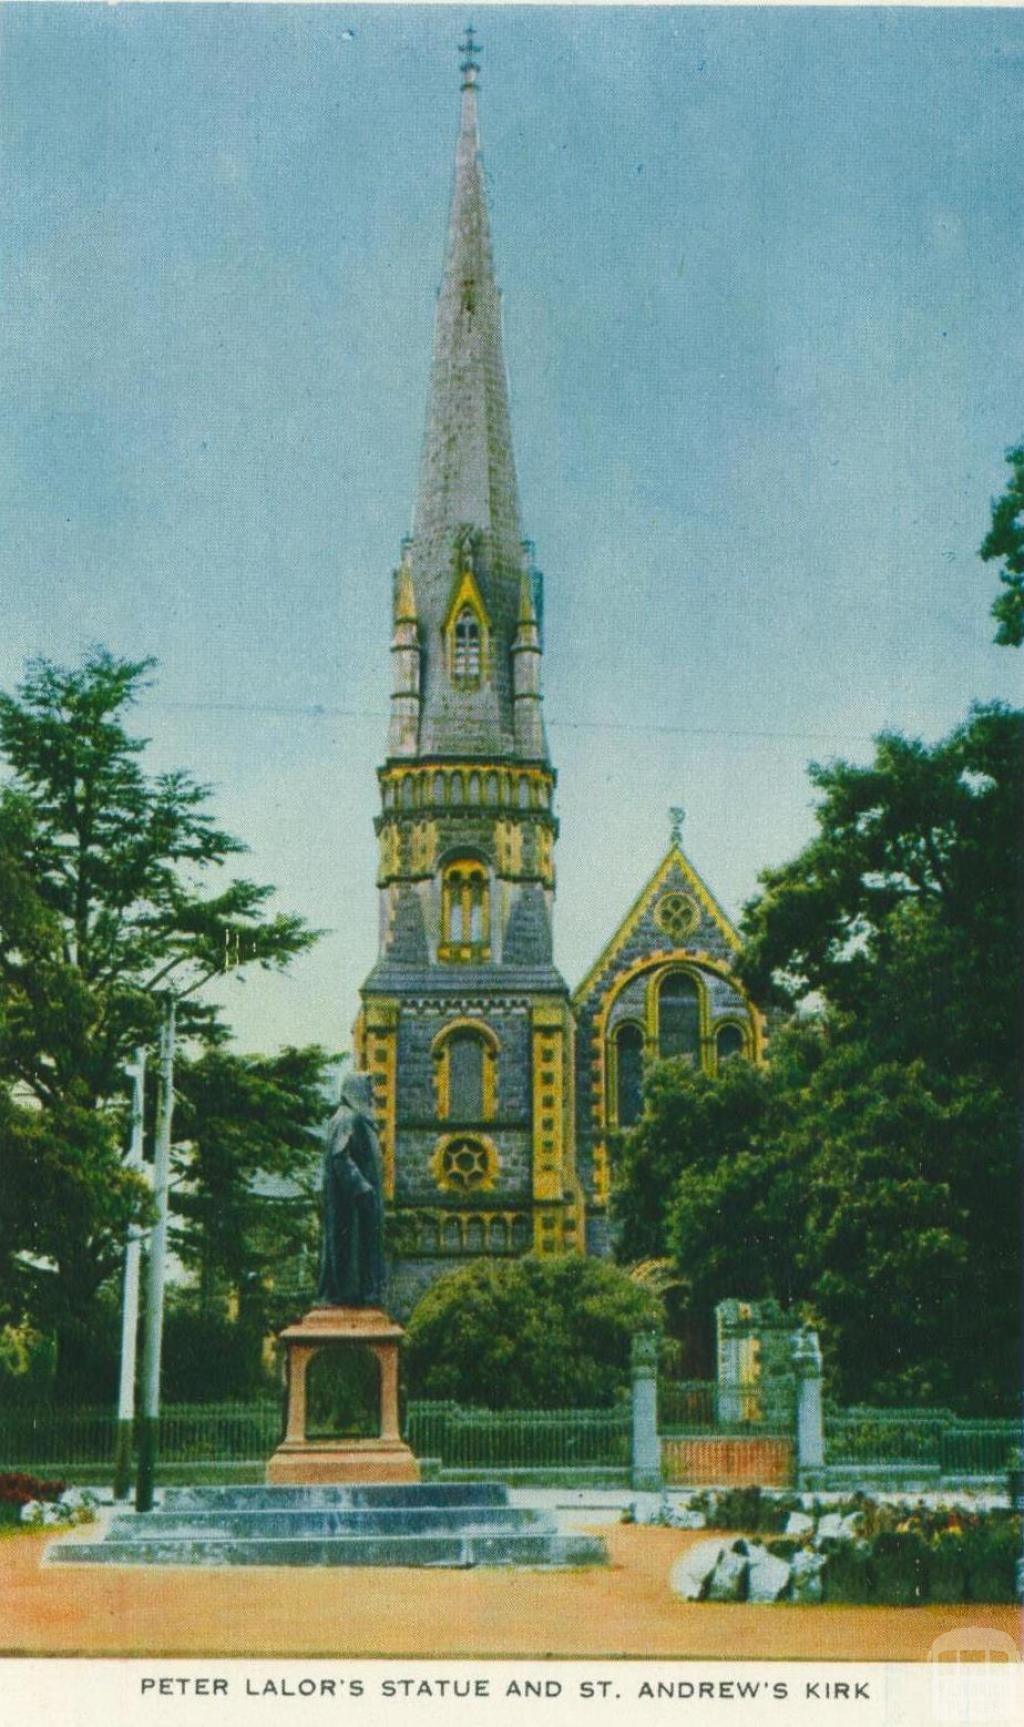 Peter Lalor's Statue and St Andrew's Kirk, Ballarat, 1958